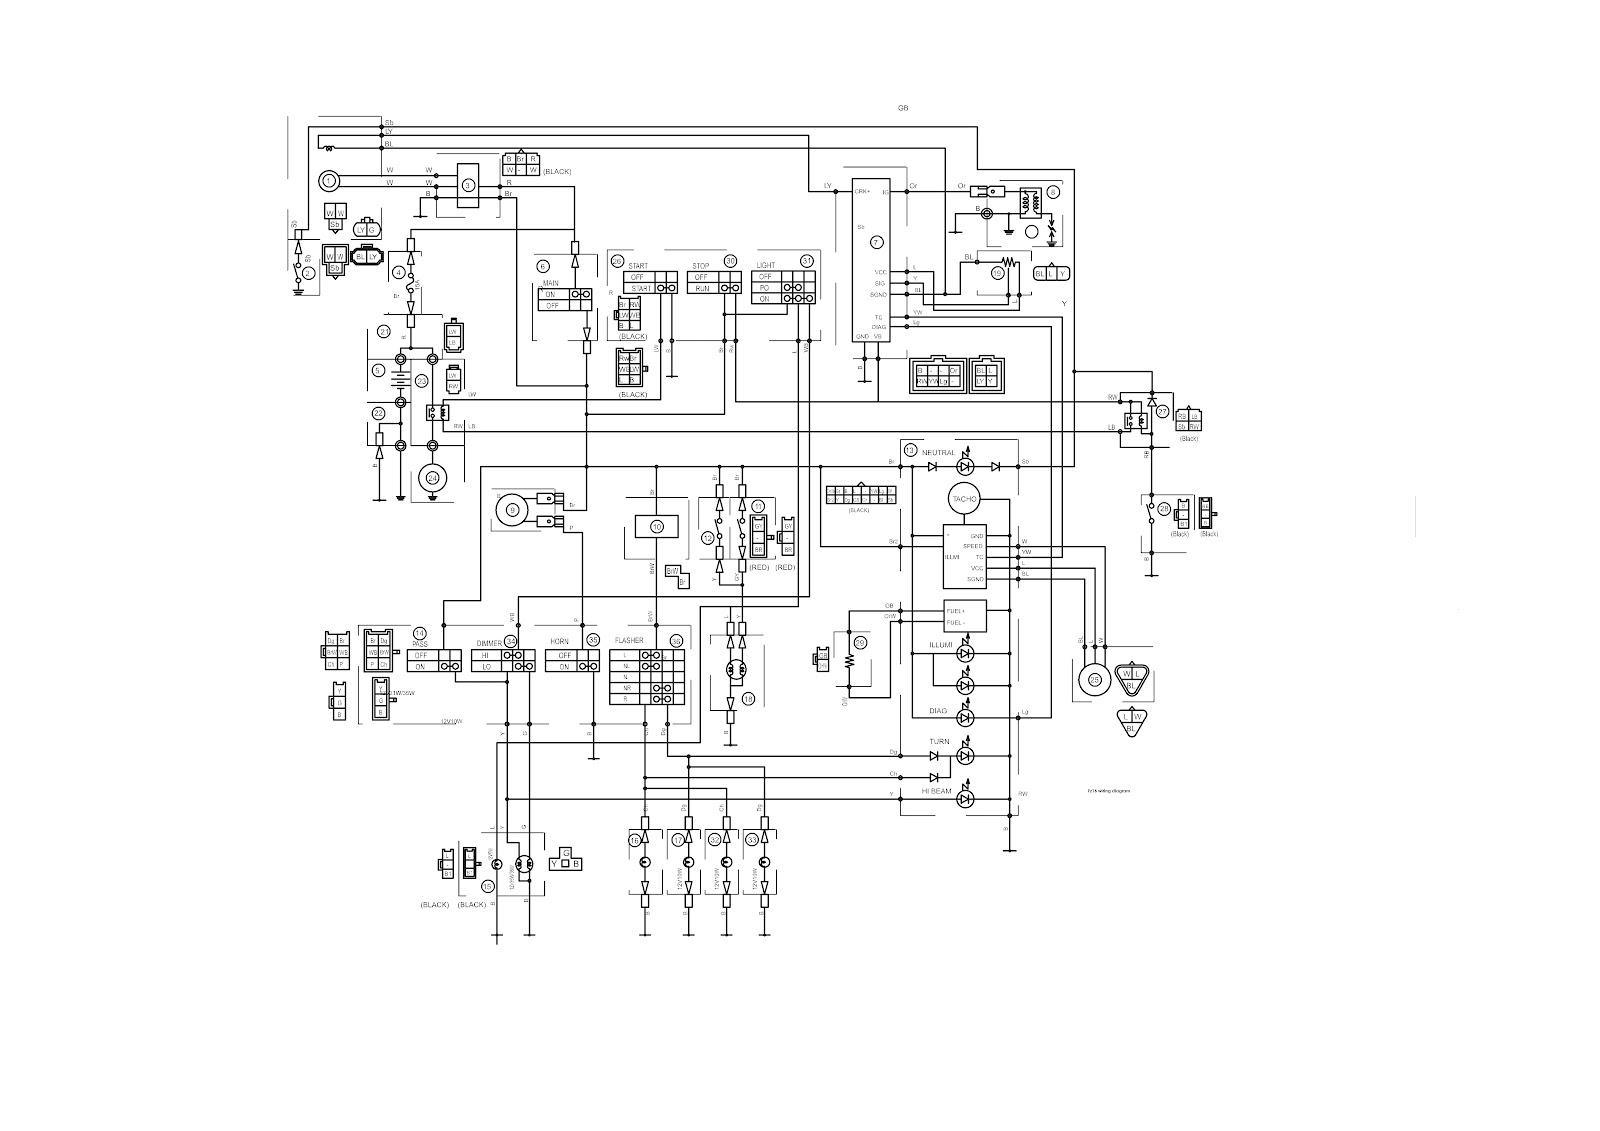 msd relay wiring diagram